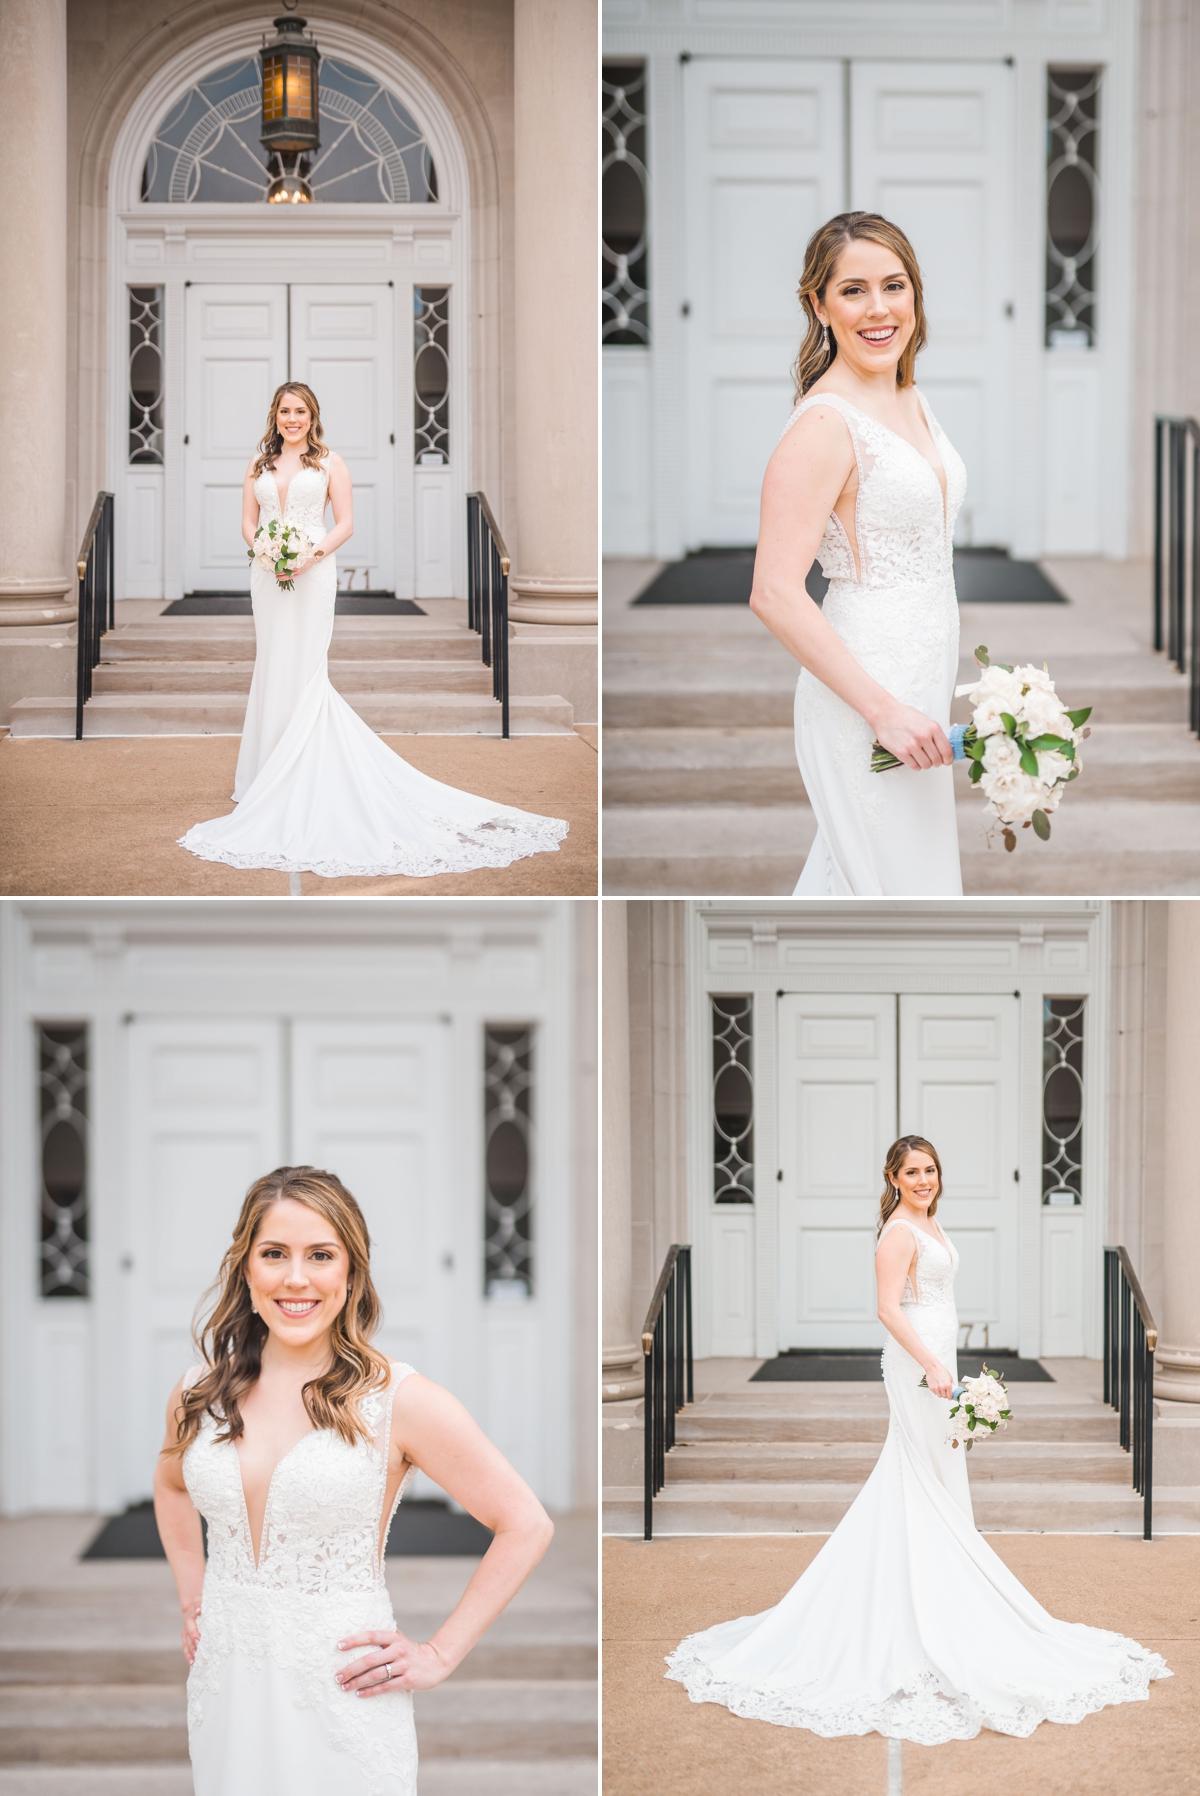 Bridal Portraits of Bride at St. Luke's United Methodist Church in Houston